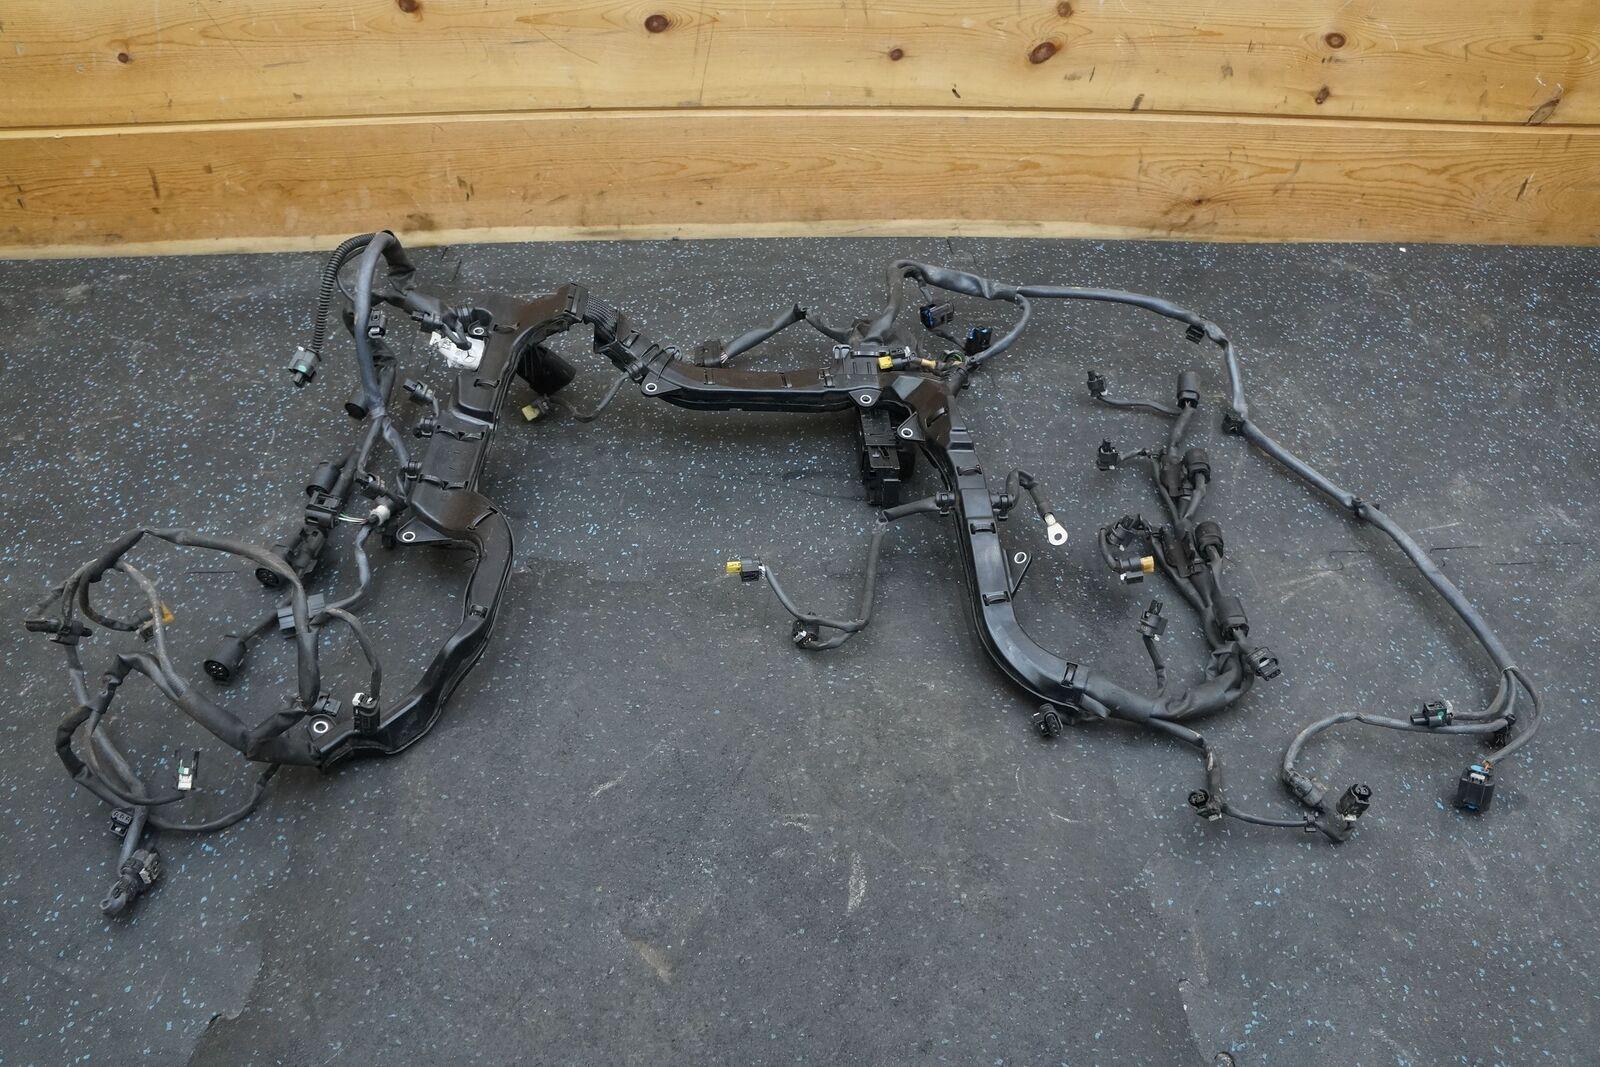 46l V8 M278 Engine Wiring Wire Harness 2781509720 Mercedes S550 W222 2014